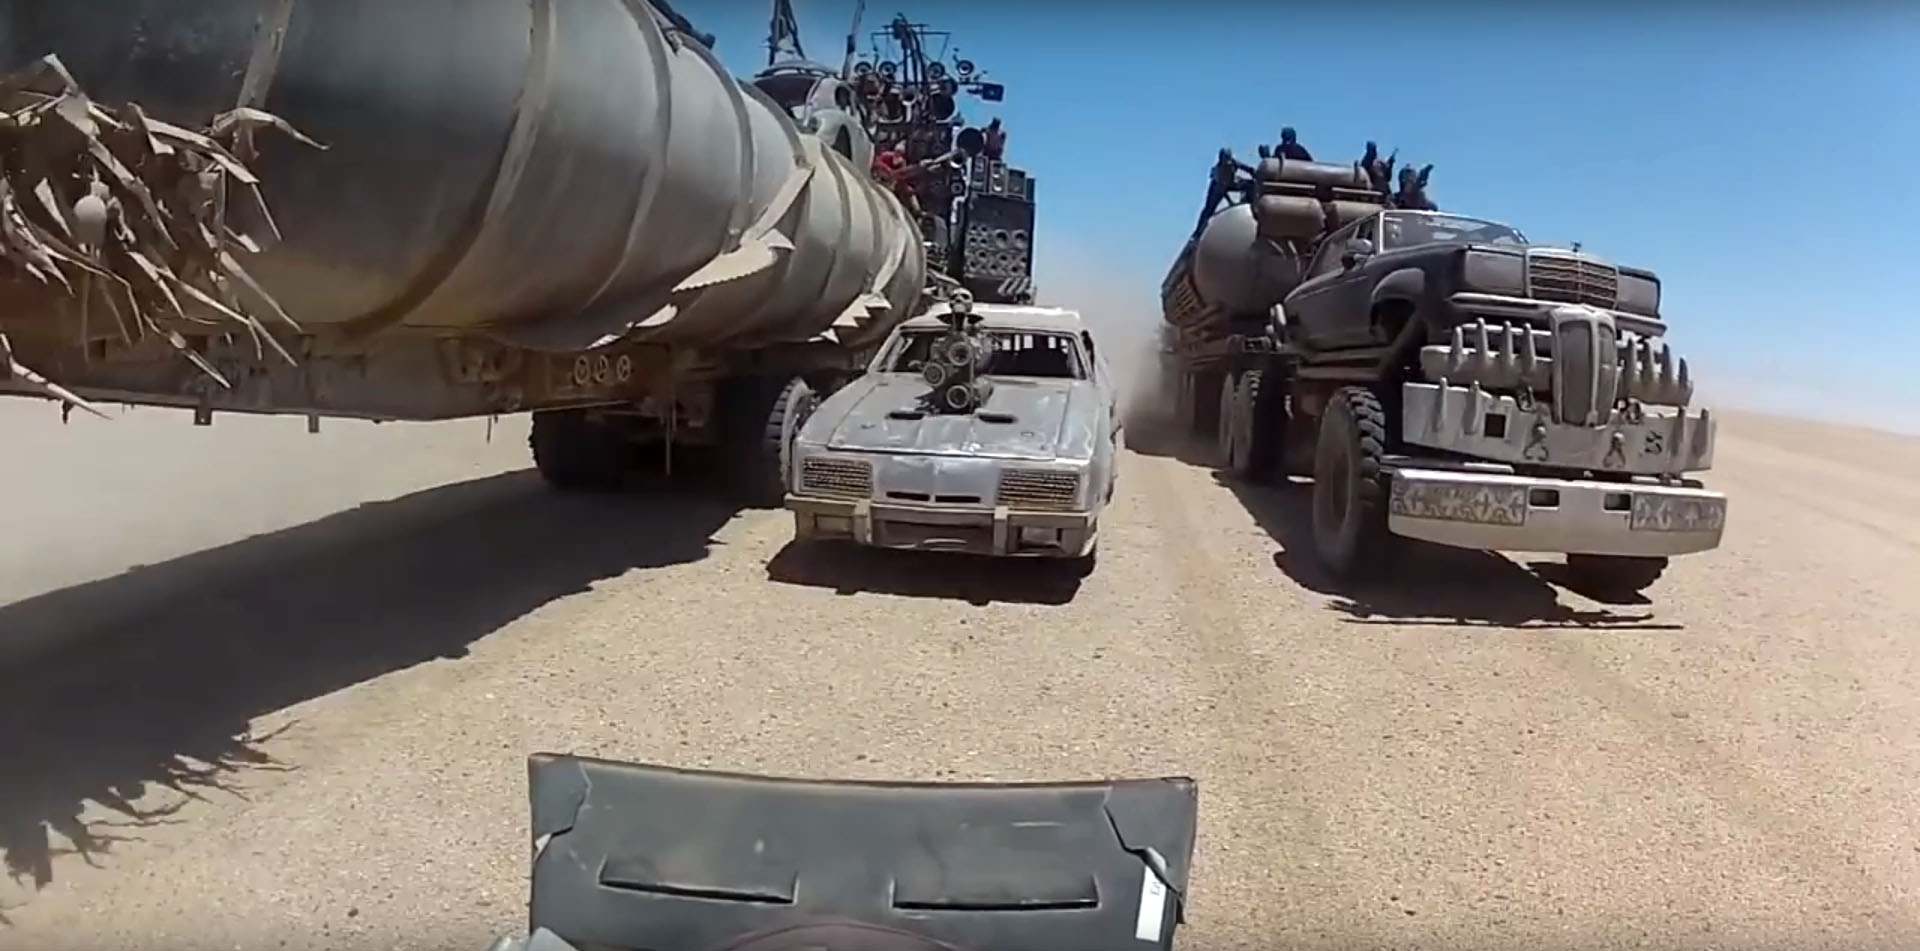 Road Warrior Trailer >> Mad Max: Fury Road New Trailer Has Epic Car Stunts - autoevolution